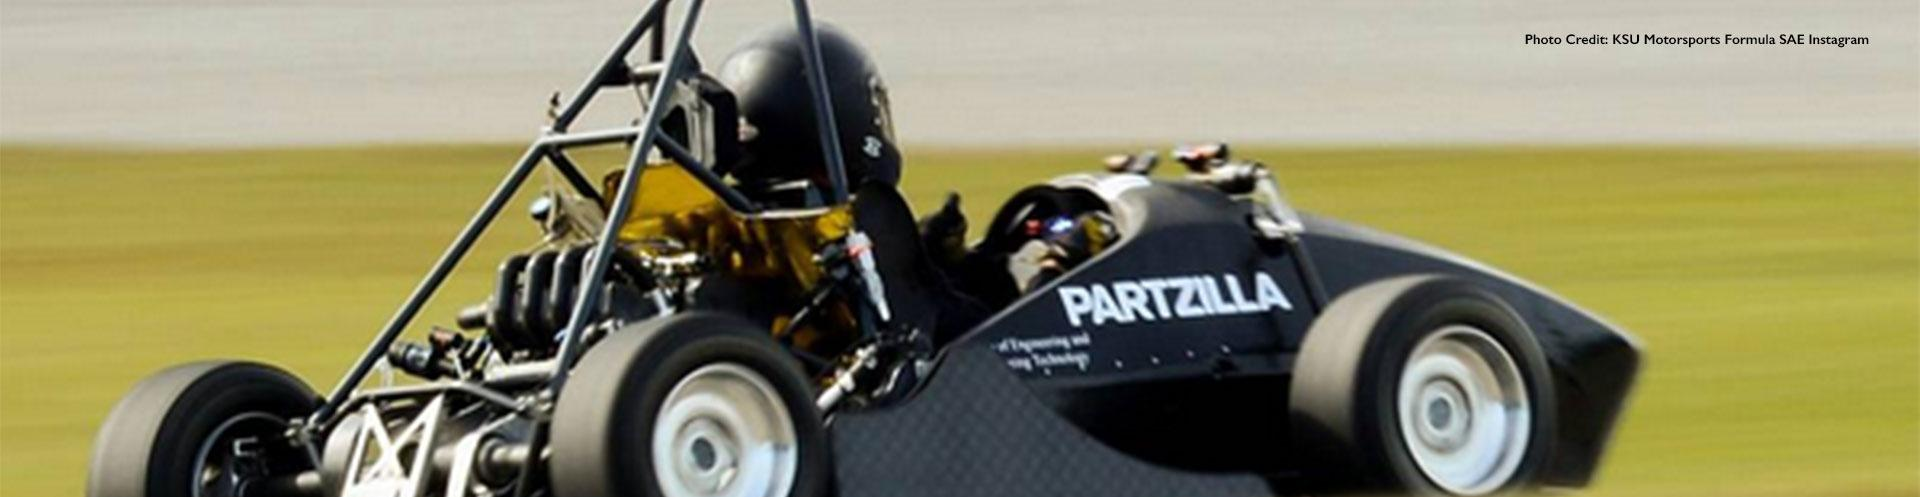 KSU's Motorsports Formula SAE Team brings home a win